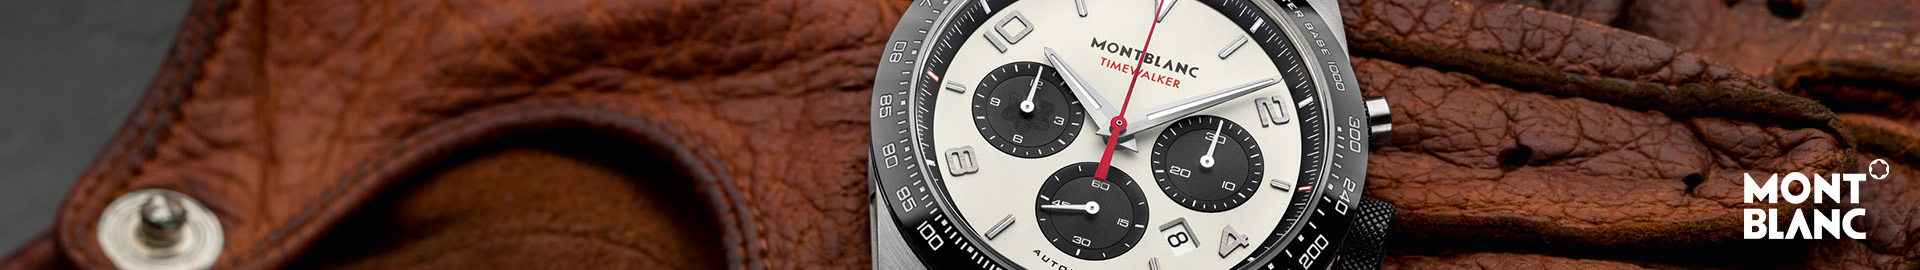 Montblanc men's watches Zazare Diamonds